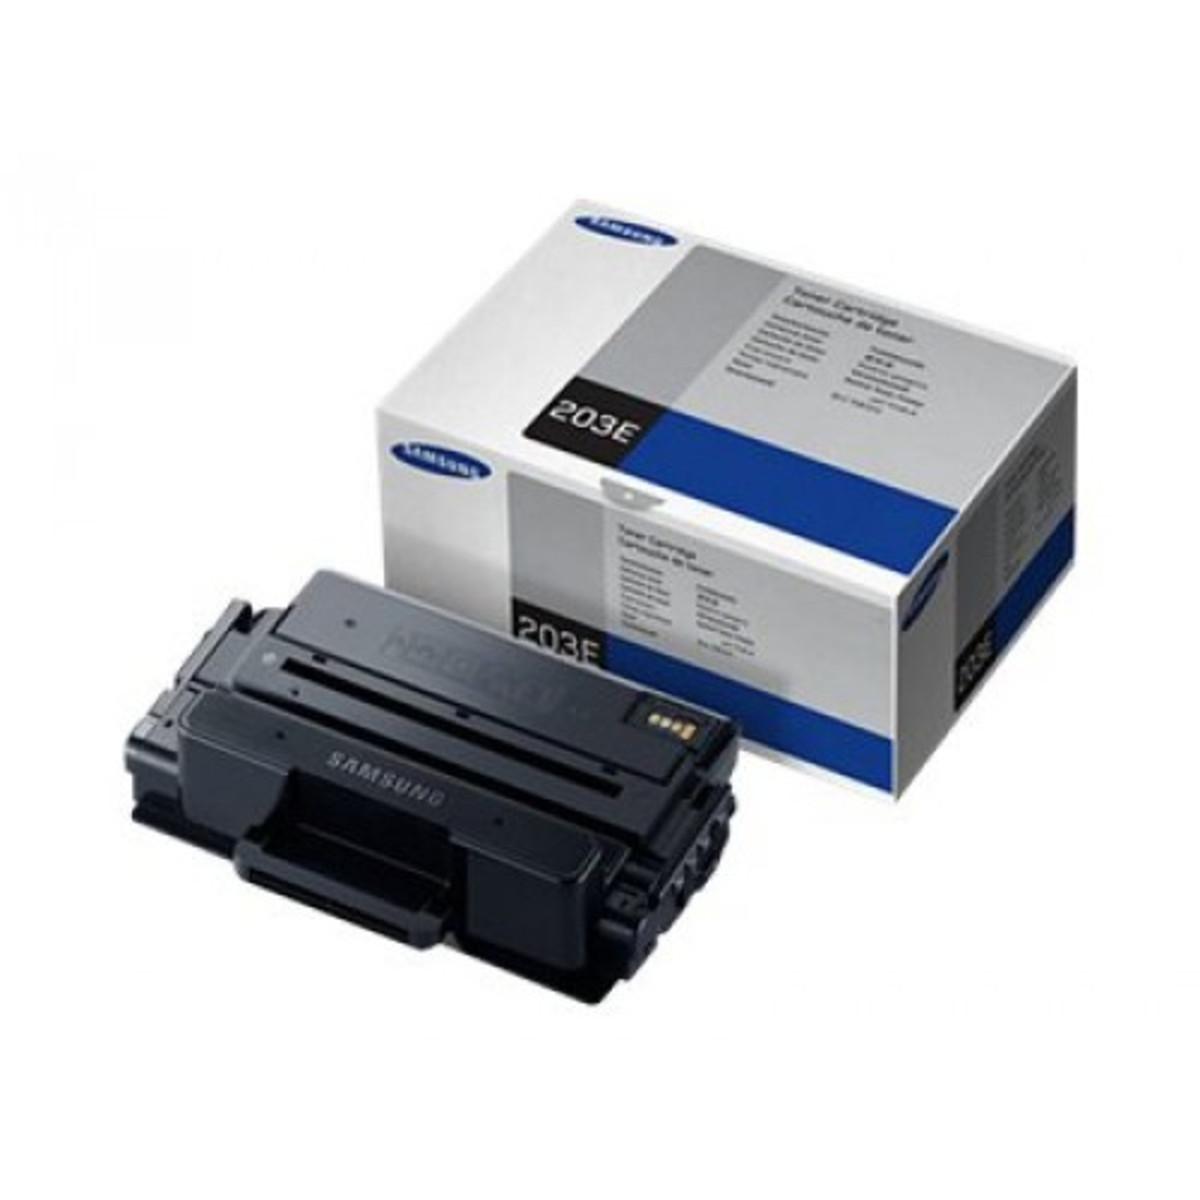 Samsung MLT-D203E Black Laser Cartridge